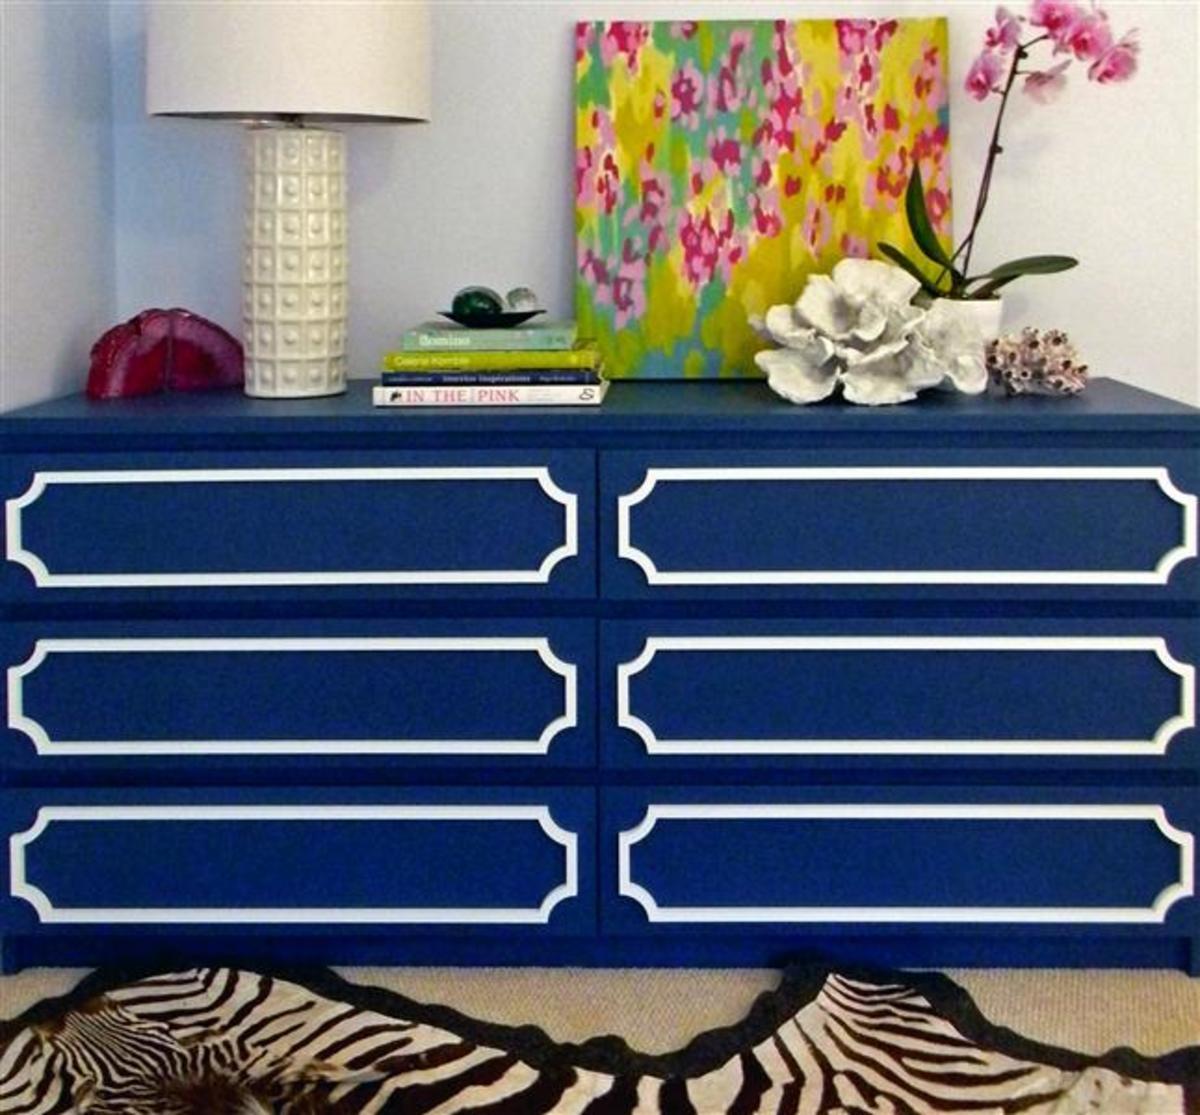 Ikea MALM dresser with O'verlays